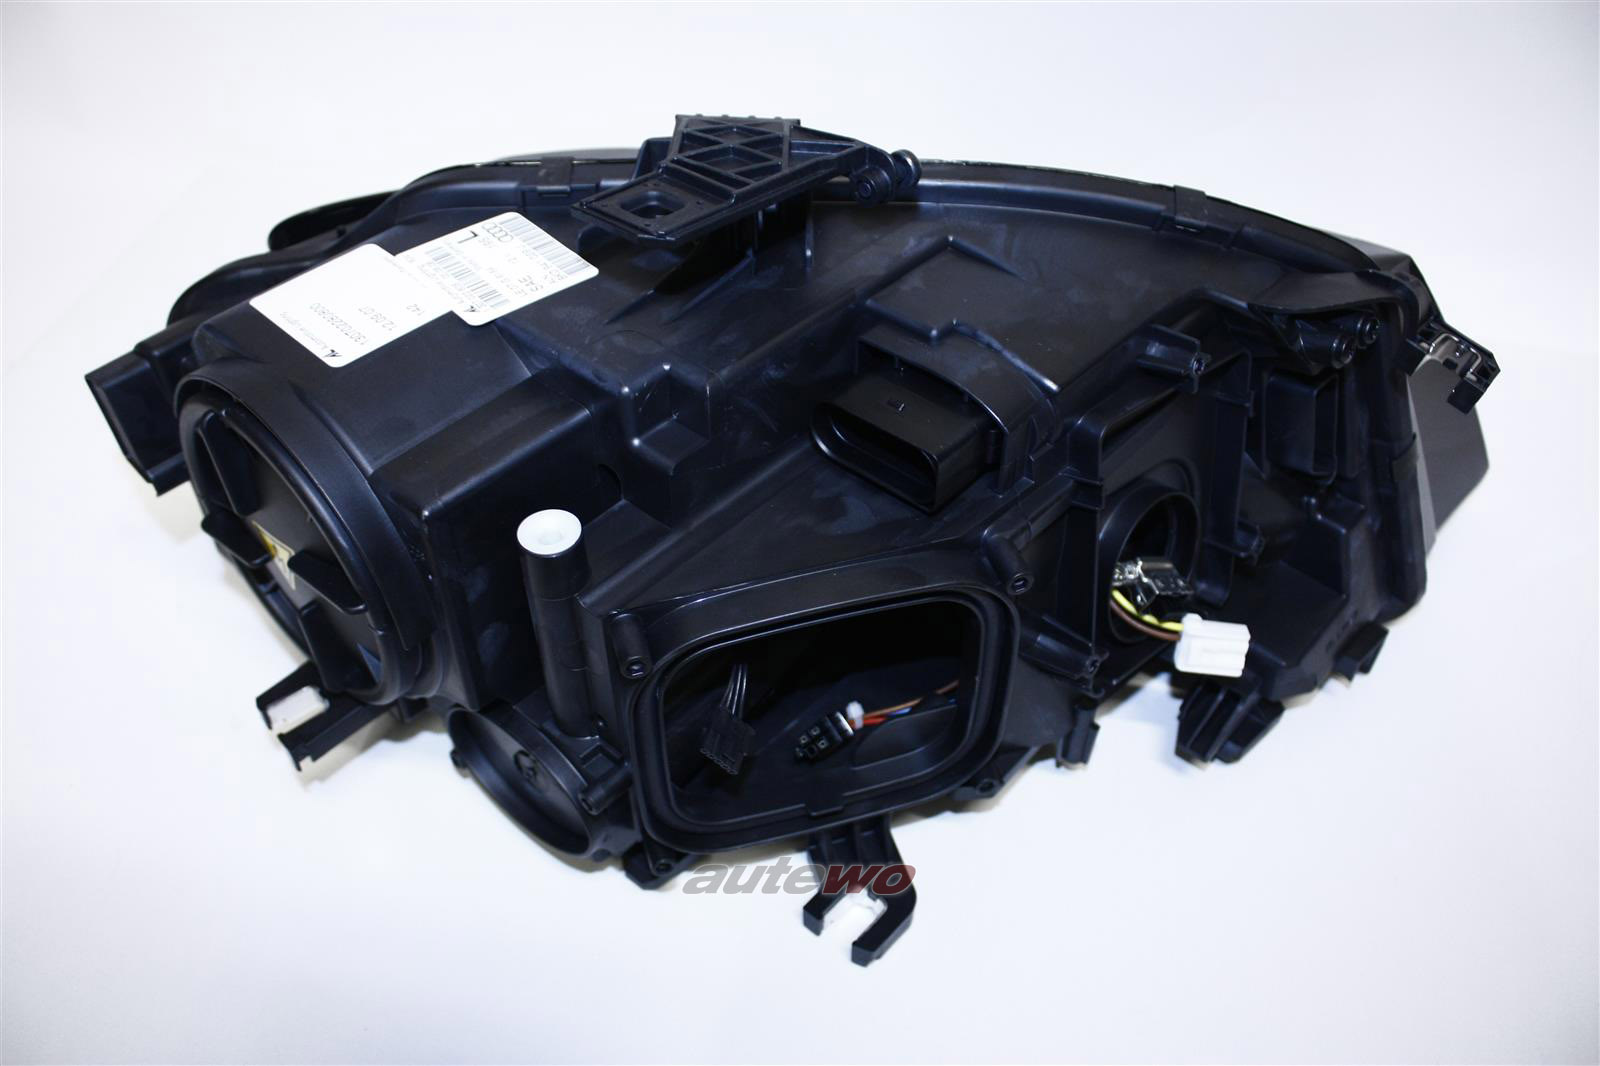 8K0941029J NEU&ORIGINAL Audi A4 8K Bi-Xenon-Scheinwerfer US-Version Links